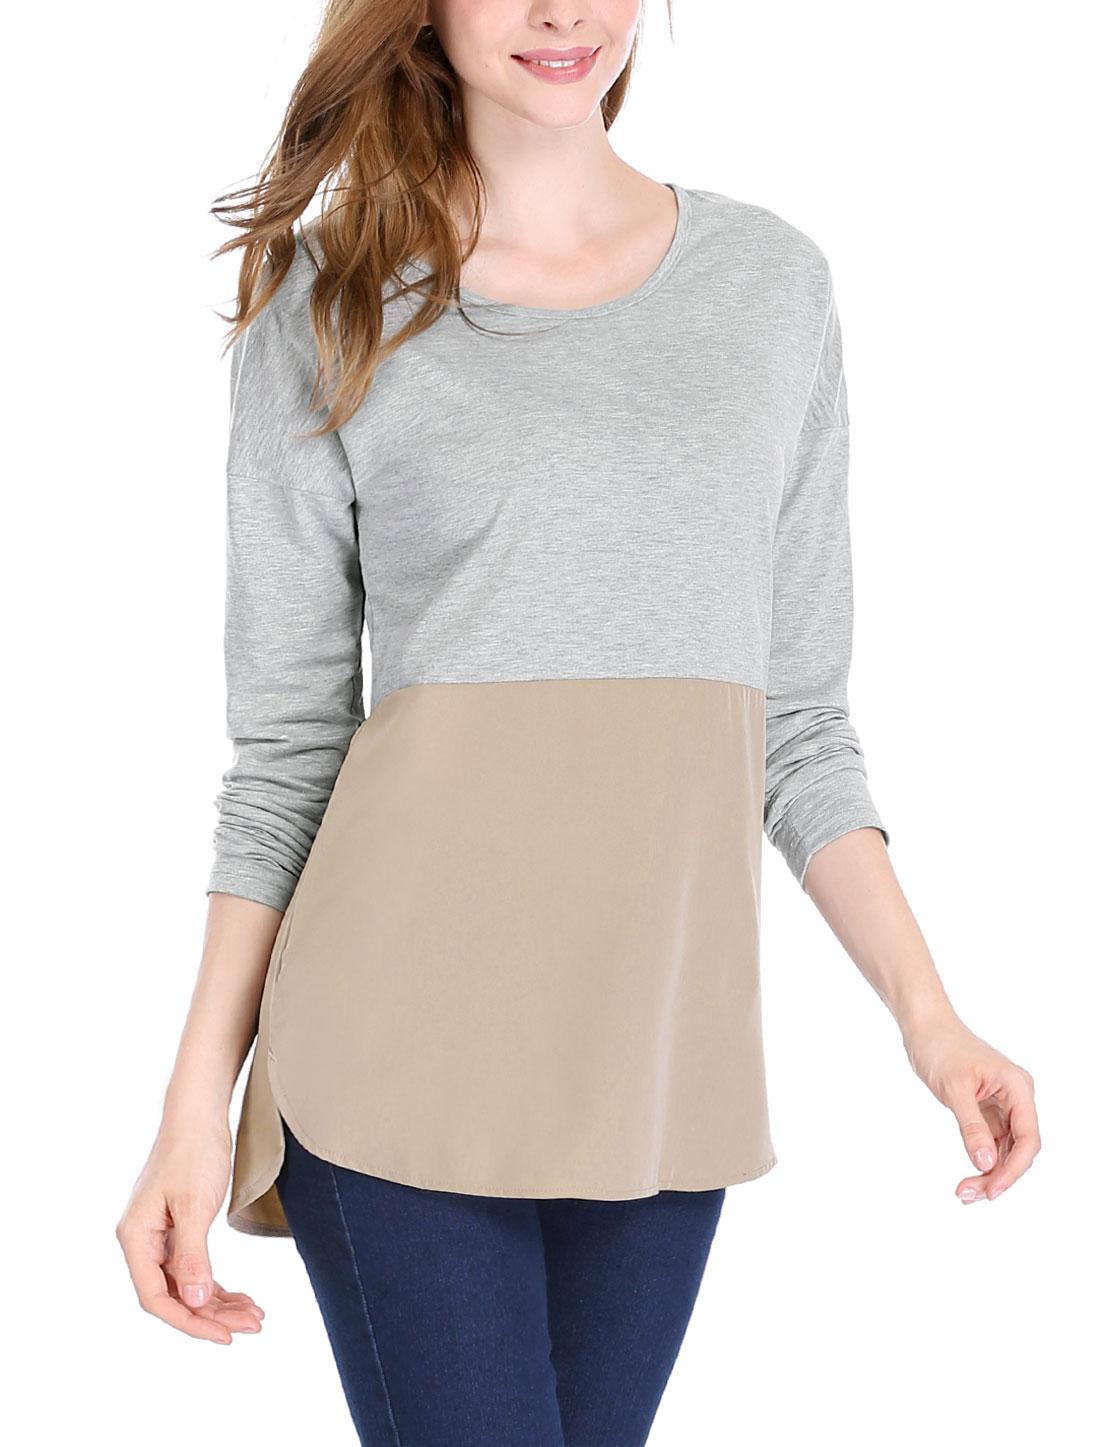 Women Drop Long Sleeves Color Block Panel Tunic Top Gray L